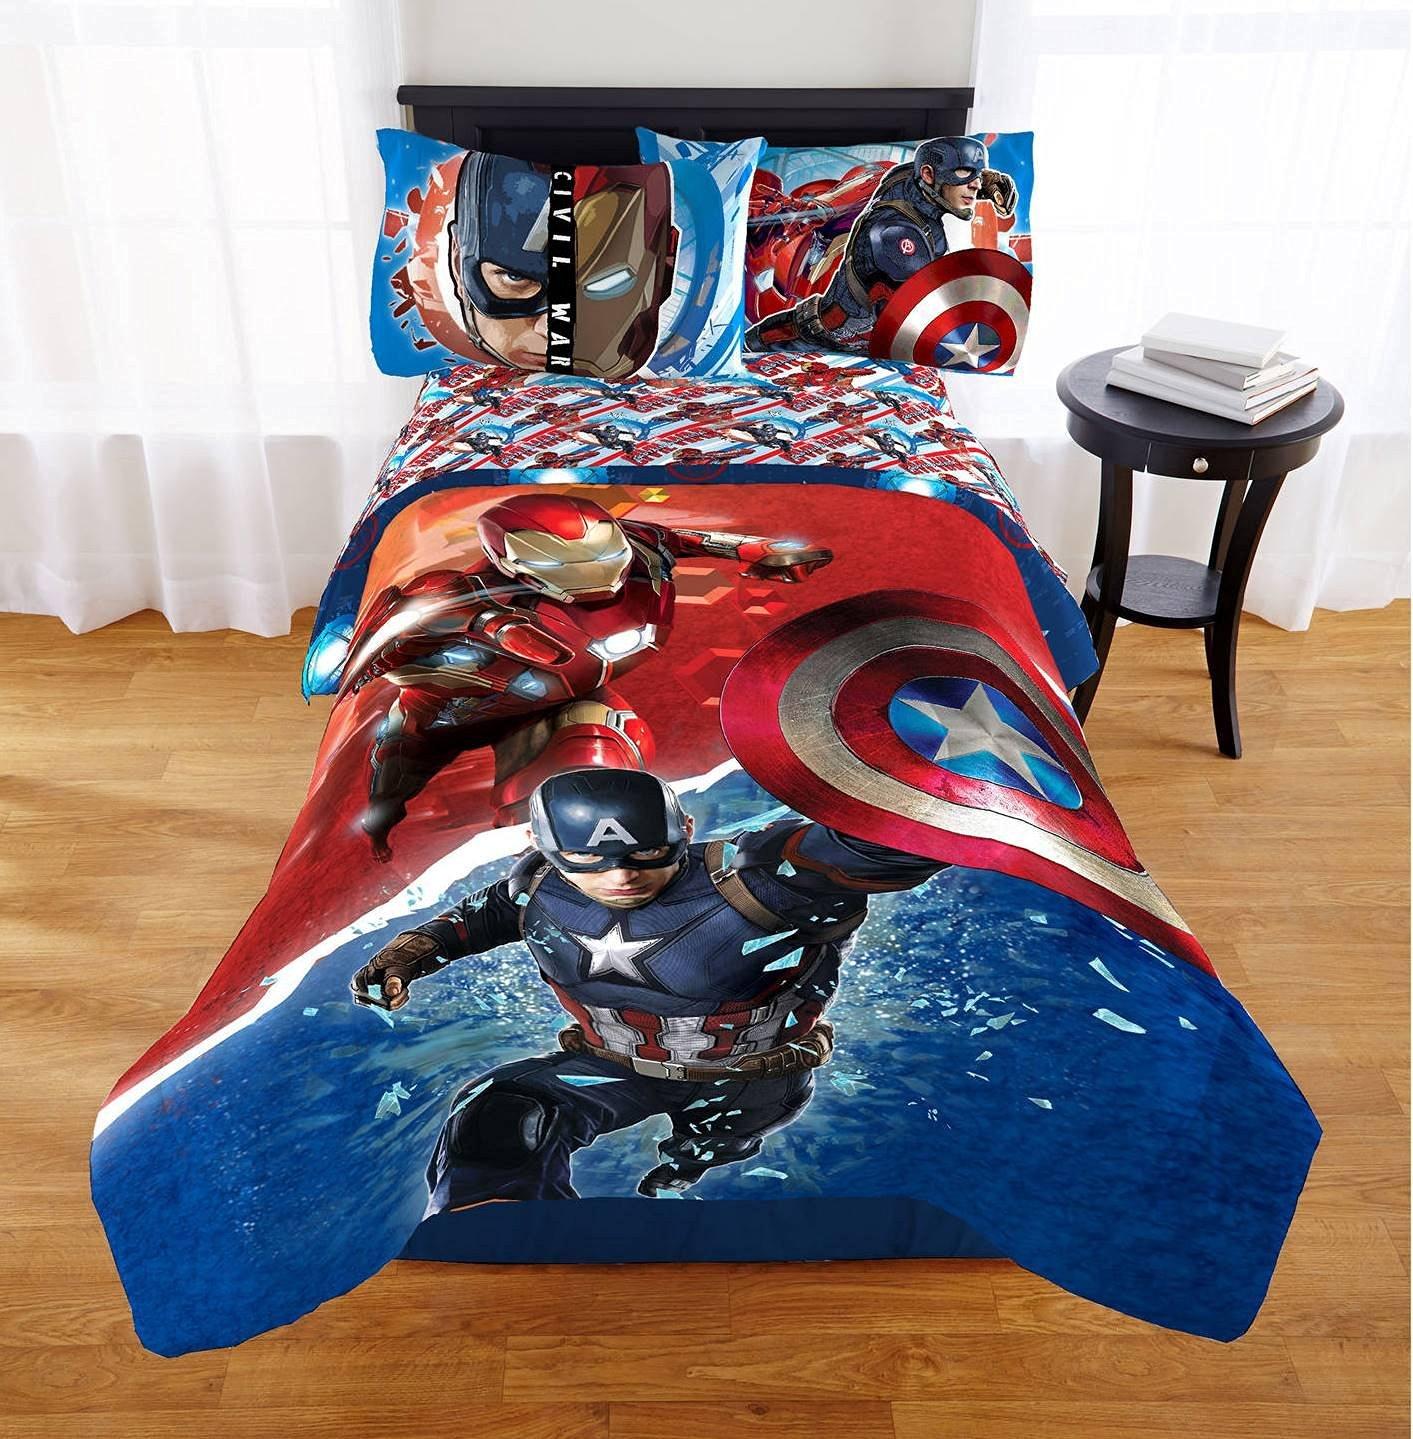 Marvel Avengers Civil War Twin/Full Comforter & Twin Sheet Set